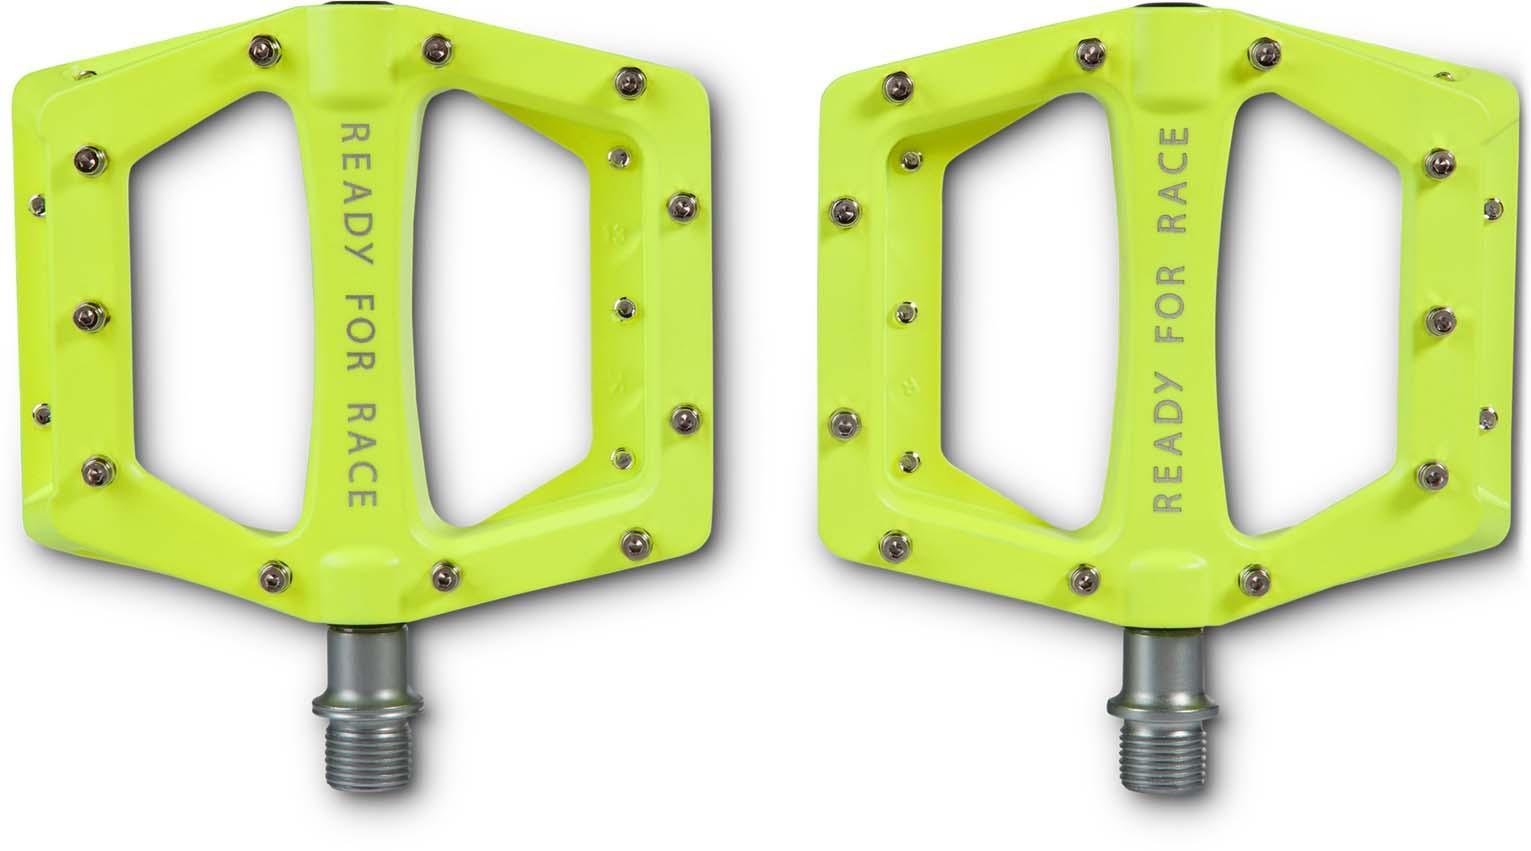 RFR pedales Flat HQP Race Black bicicleta pedales anti-slip pins; reflectores